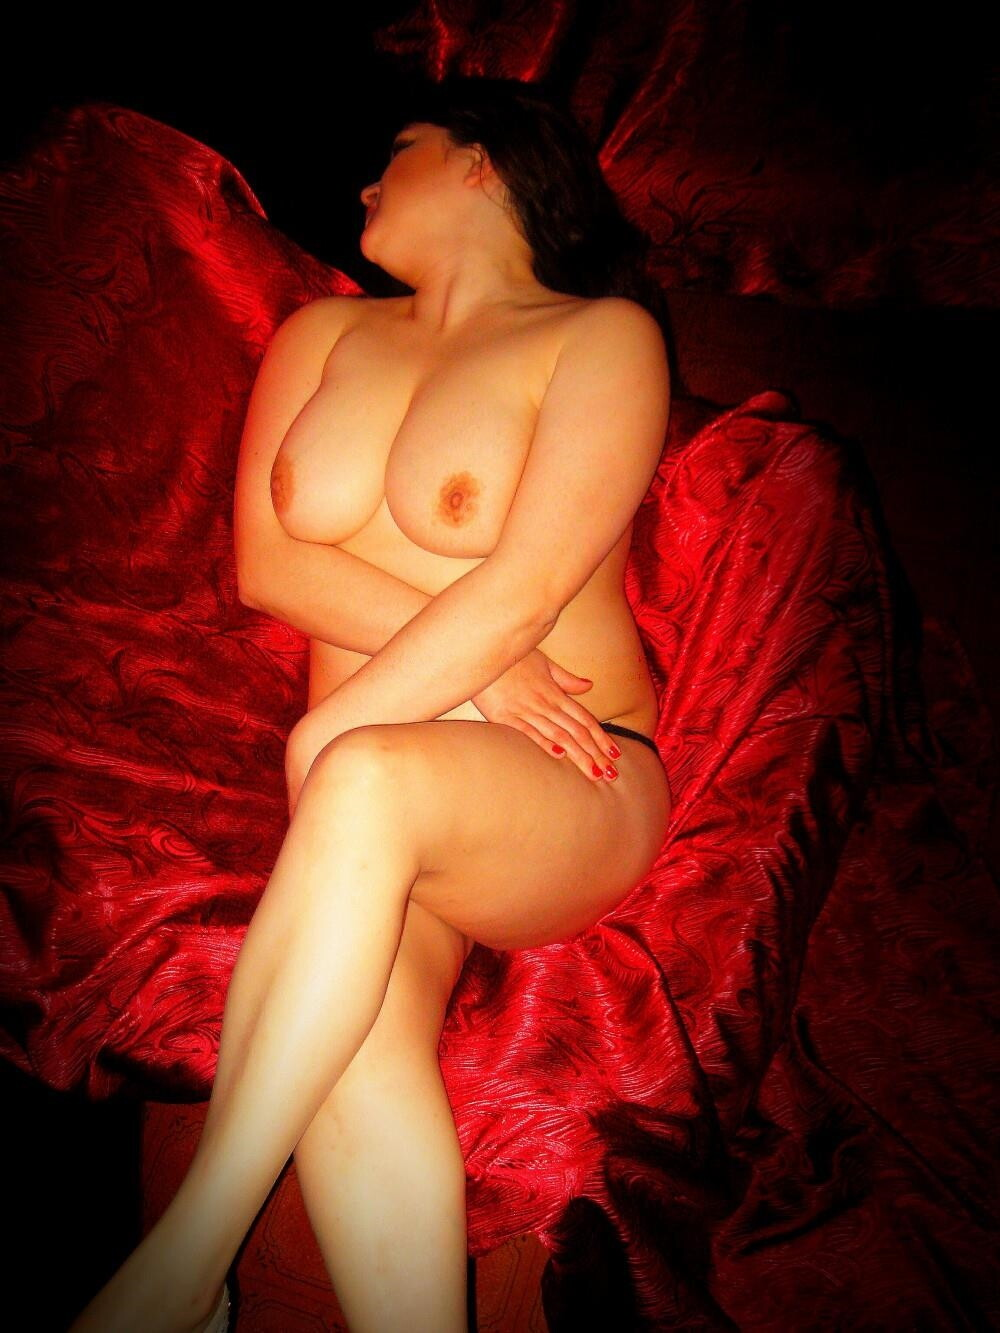 Проститутки индивидуалка красноярск проститутки из кыргызстане